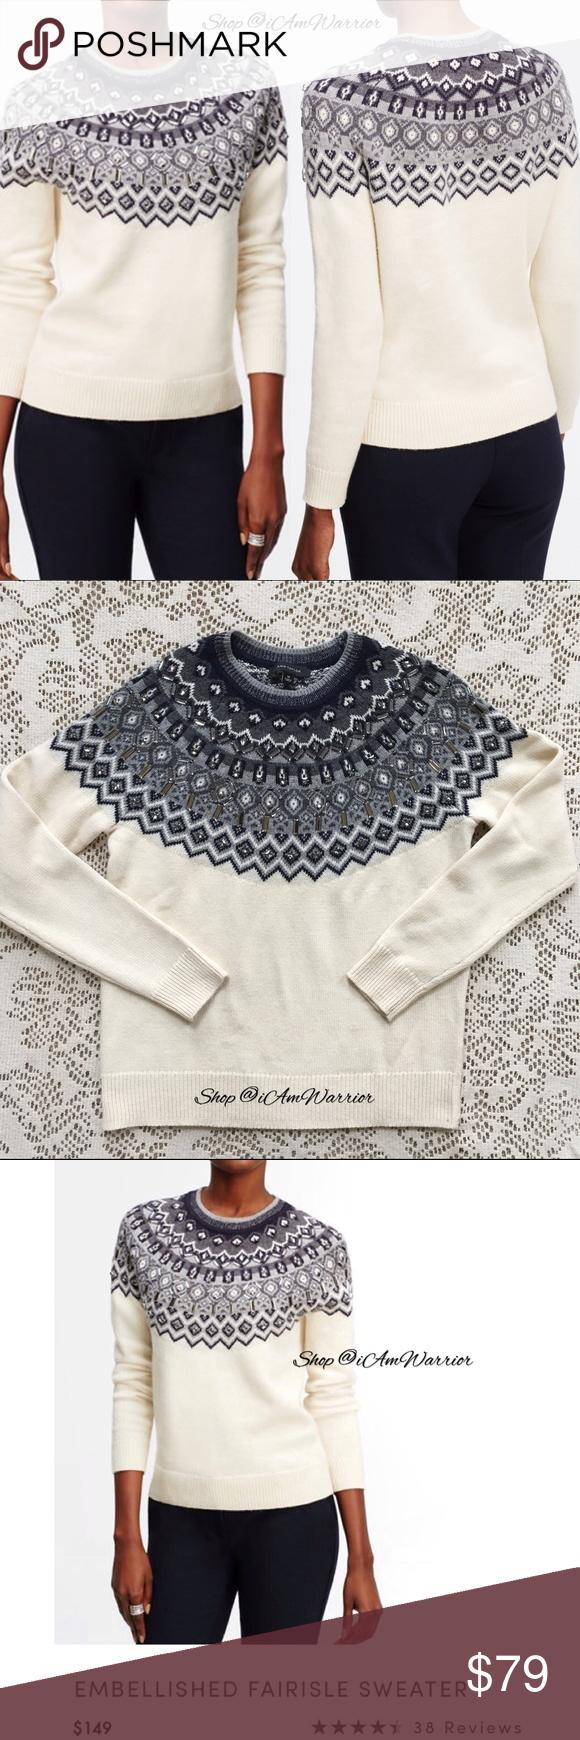 Ann Taylor embellished fair isle sweater Beyond gorgeous Ann ...